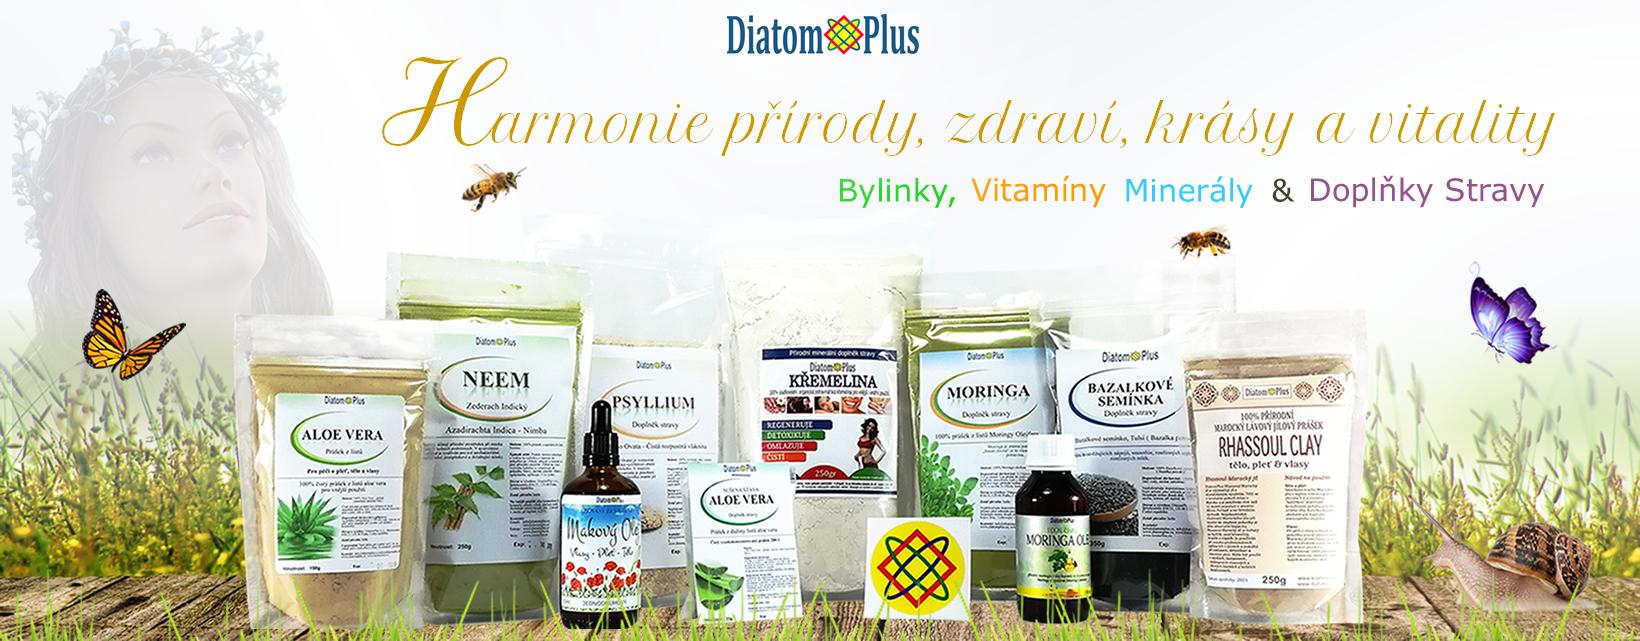 harmonie-prirody-zdravi-krasy-vitality-banner-home-1